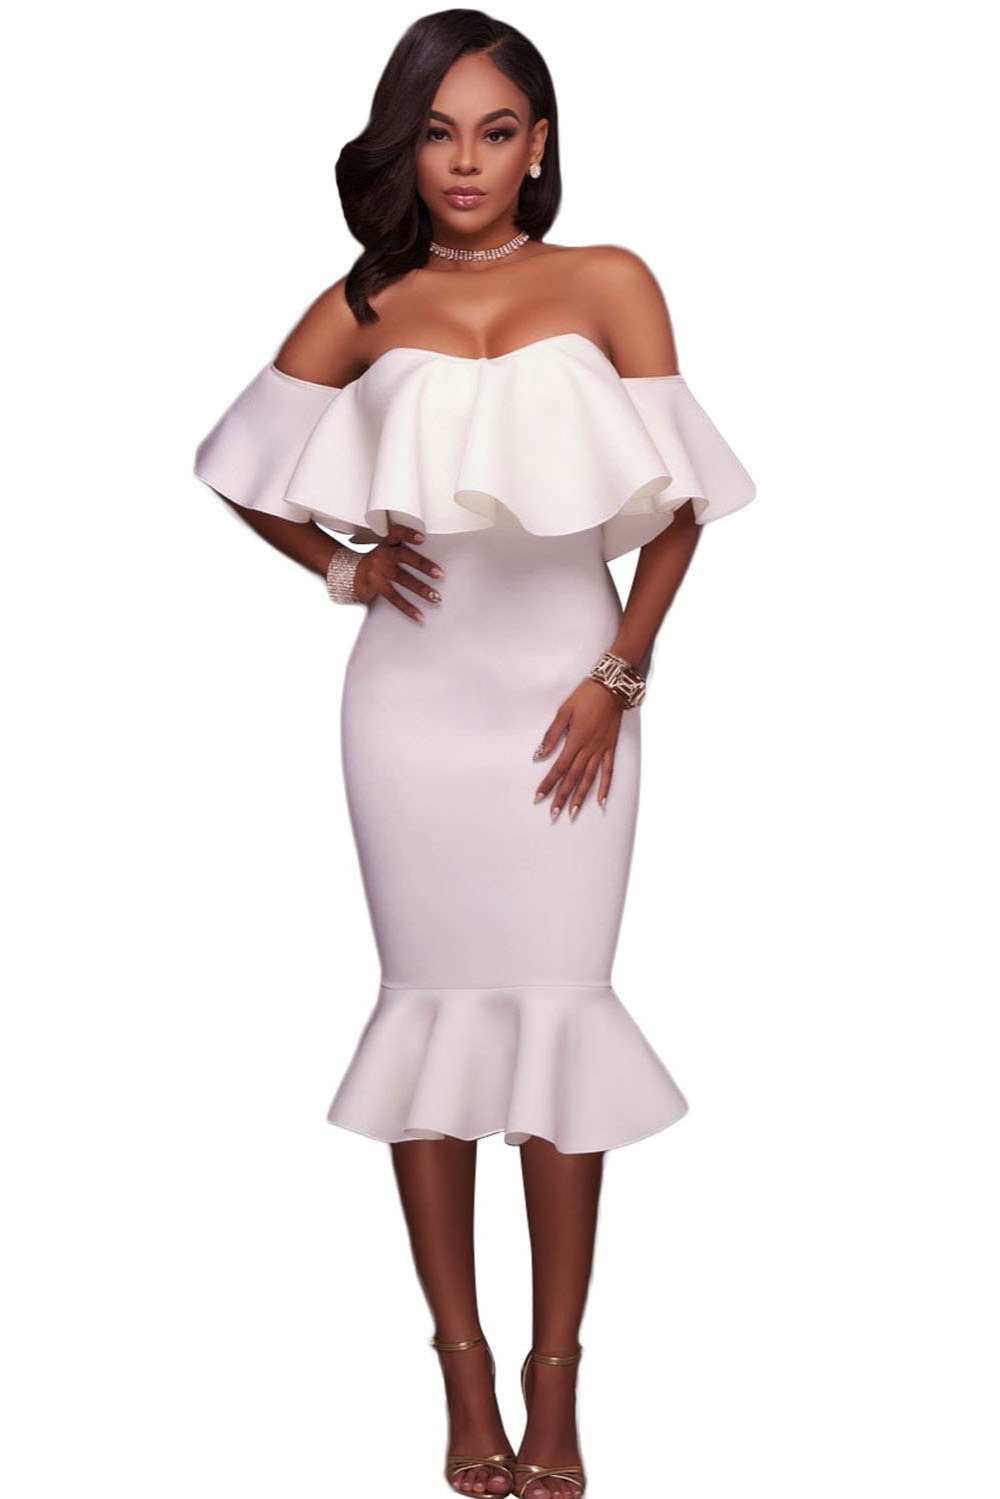 Plus Size Off The Shoulder White Dress | RLDM